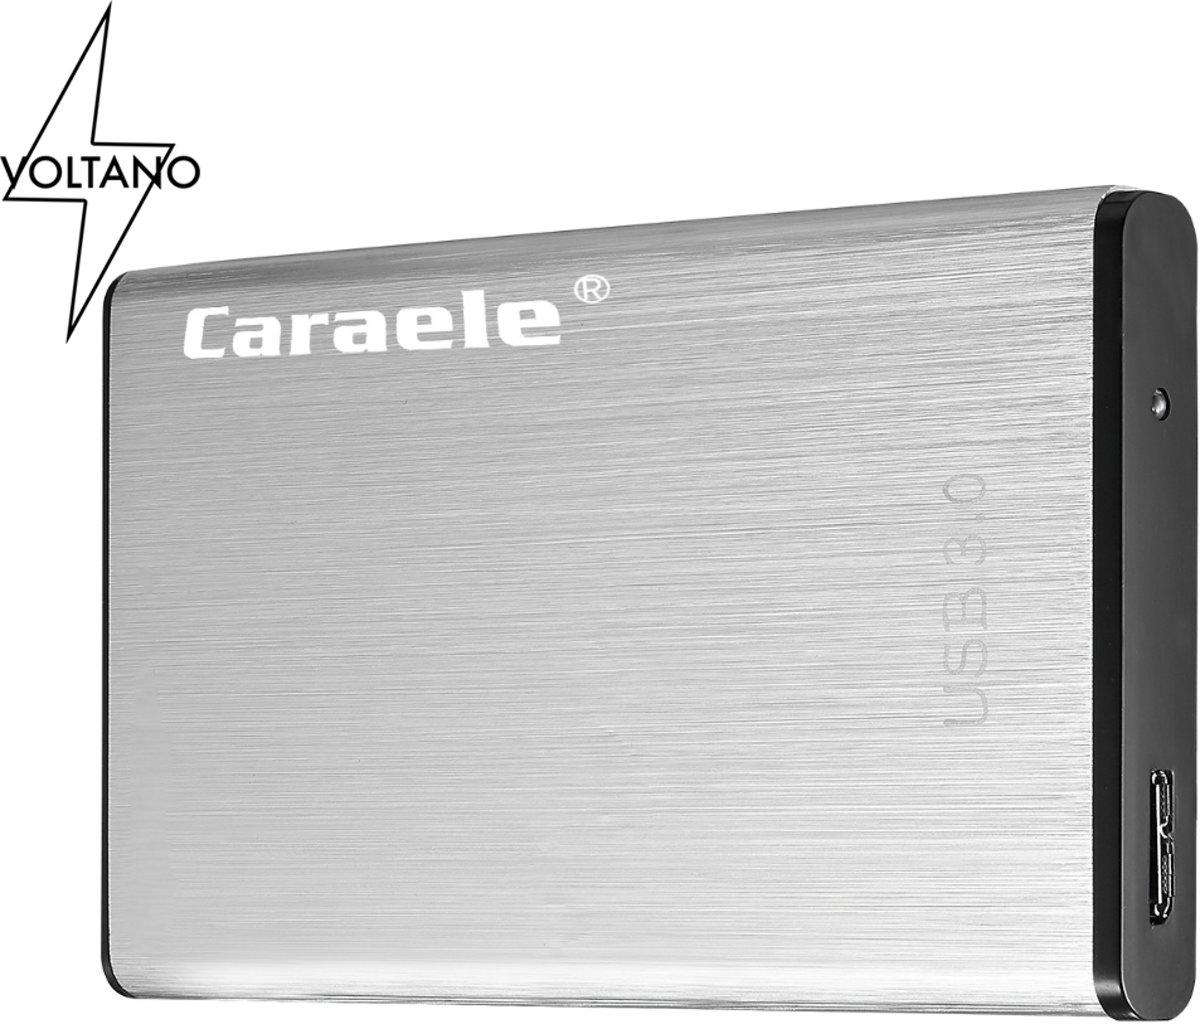 Voltano Compacte Portable Externe Harde Schijf 500GB MAC Grijs kopen